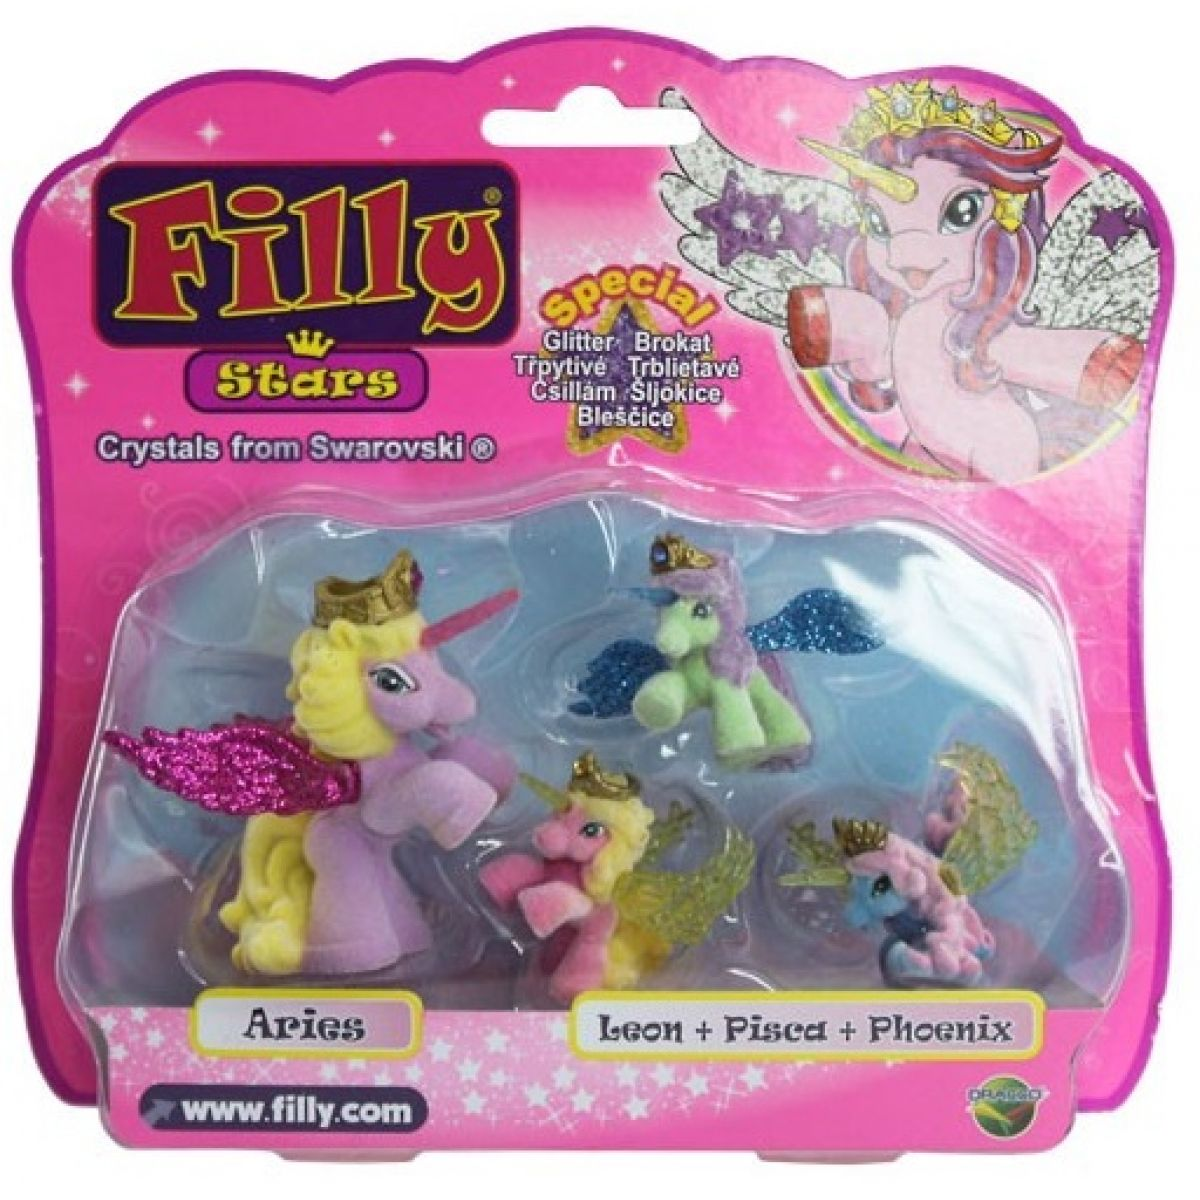 Filly Stars Glitter Rodinka 1+3 - Aries